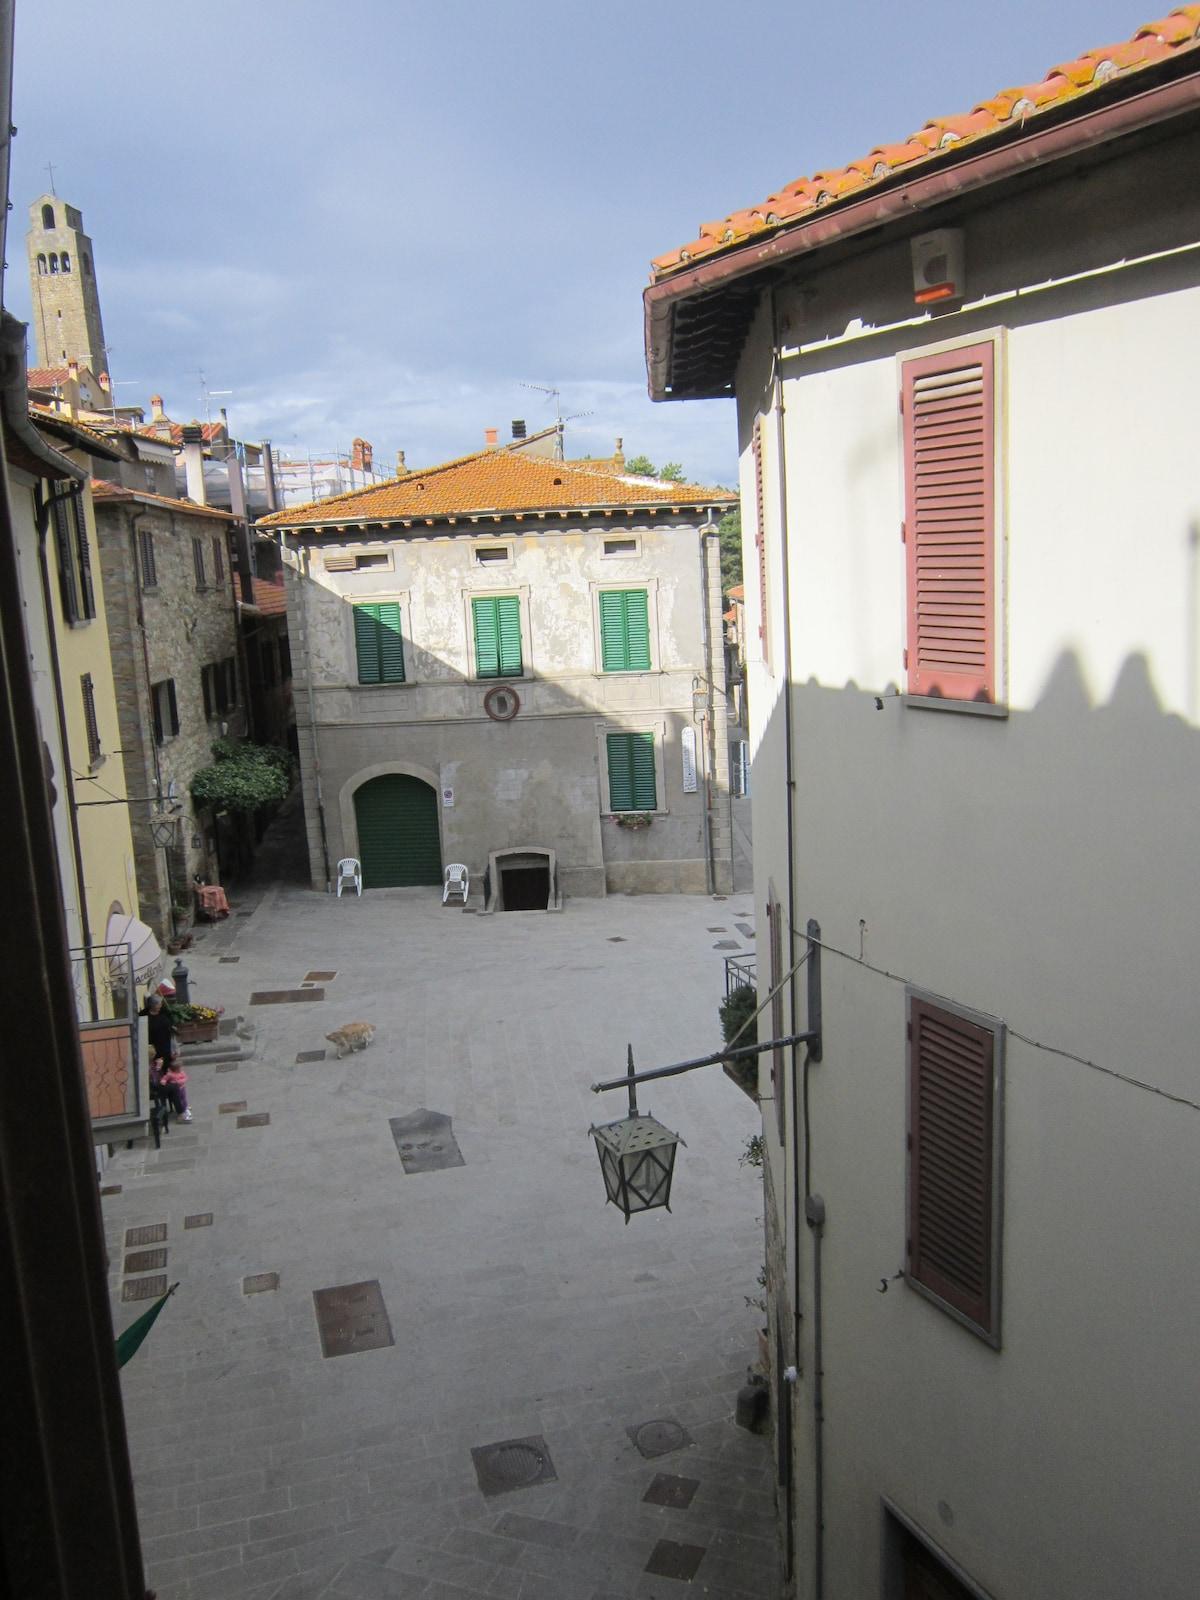 Tuscany boccatorta unforgettable